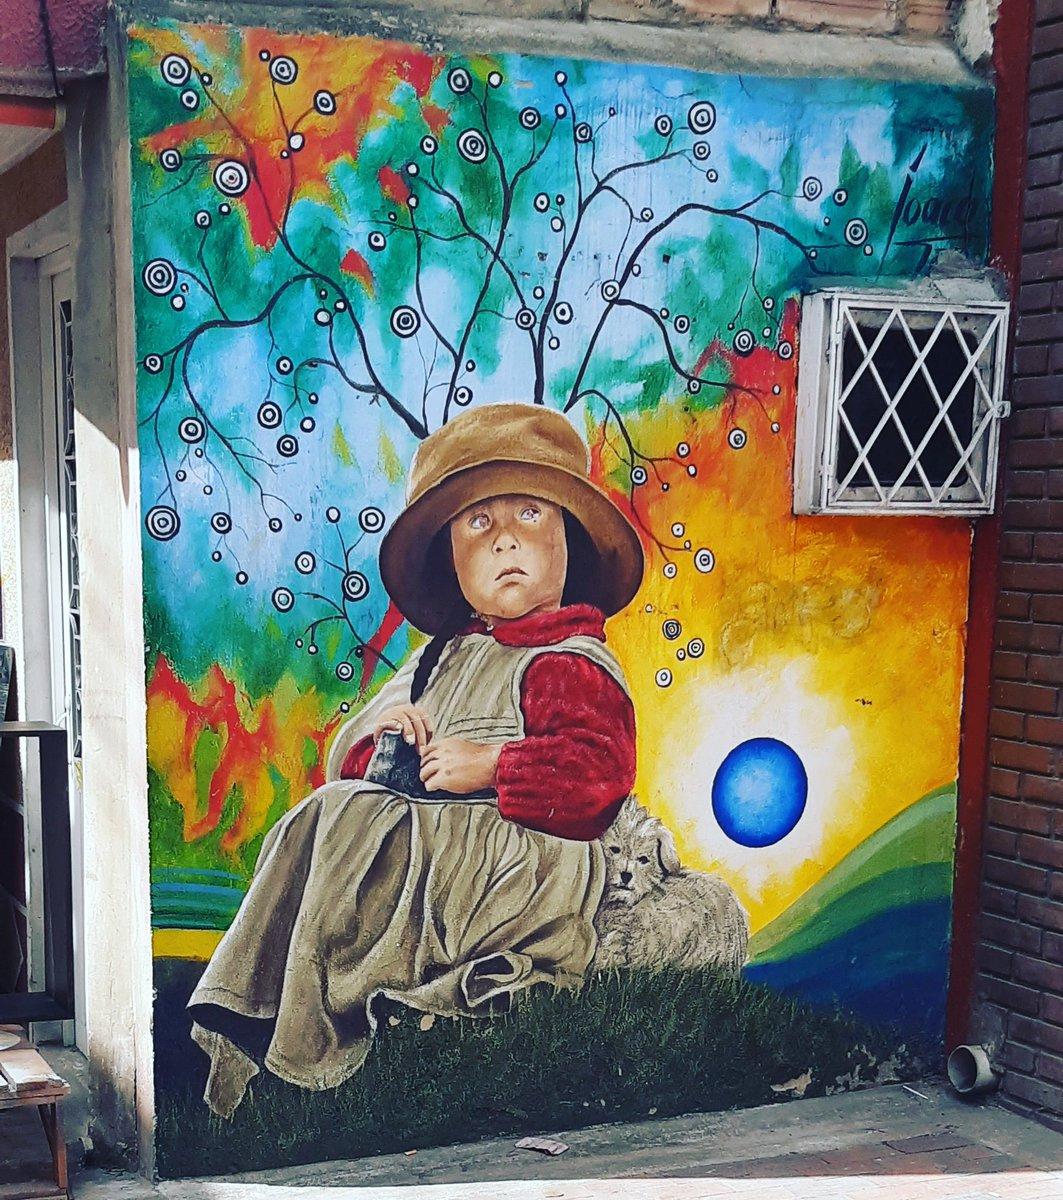 Lunes . . . . #Colombia #Bogotá#StreetArt #artecallejero #graffiti #urbanart #arteurbano #graffitiart  #streetarteverywhere #mural #artemuro #wallart #contemporaryart #streets #uniquestreets #artdisplay #photography  #delacalle  #streetartphotography  #androidphotographypic.twitter.com/xJ8zZIxdFy